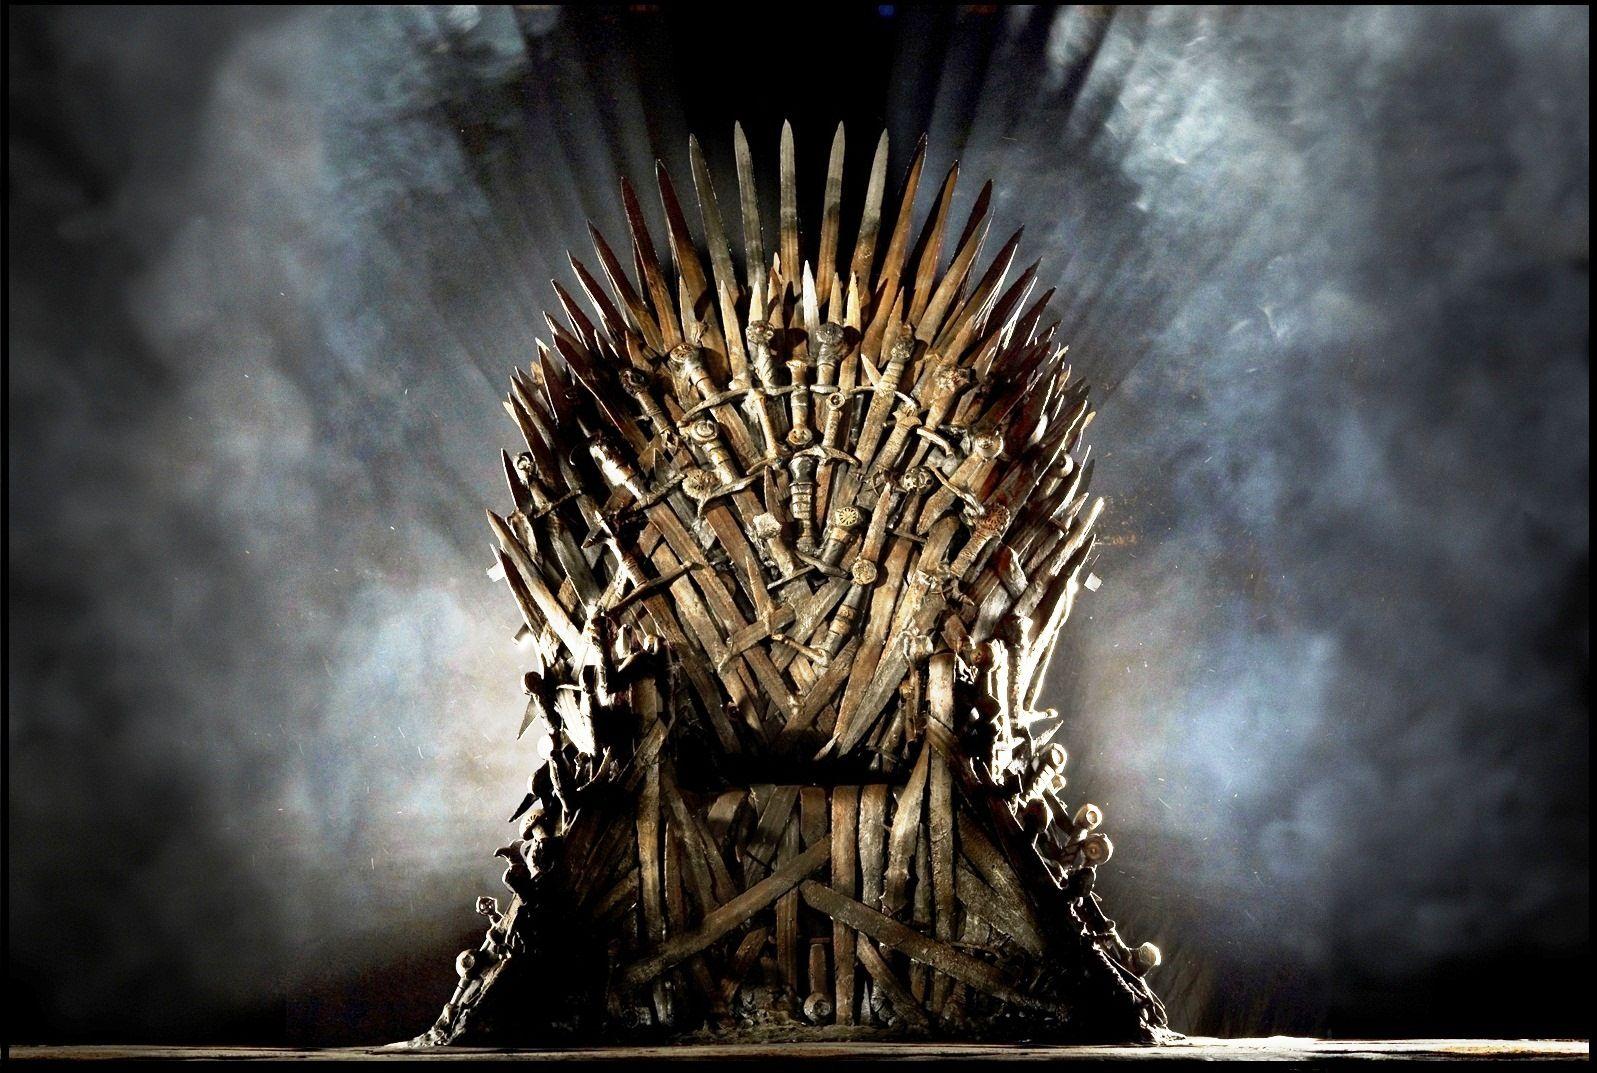 Piratage Hbo Une Rancon Salee Et Des Emails Devoiles Https T Co Jhwoaexfcc Iron Throne Game Of Thrones Prequel Game Of Thrones Cocktails